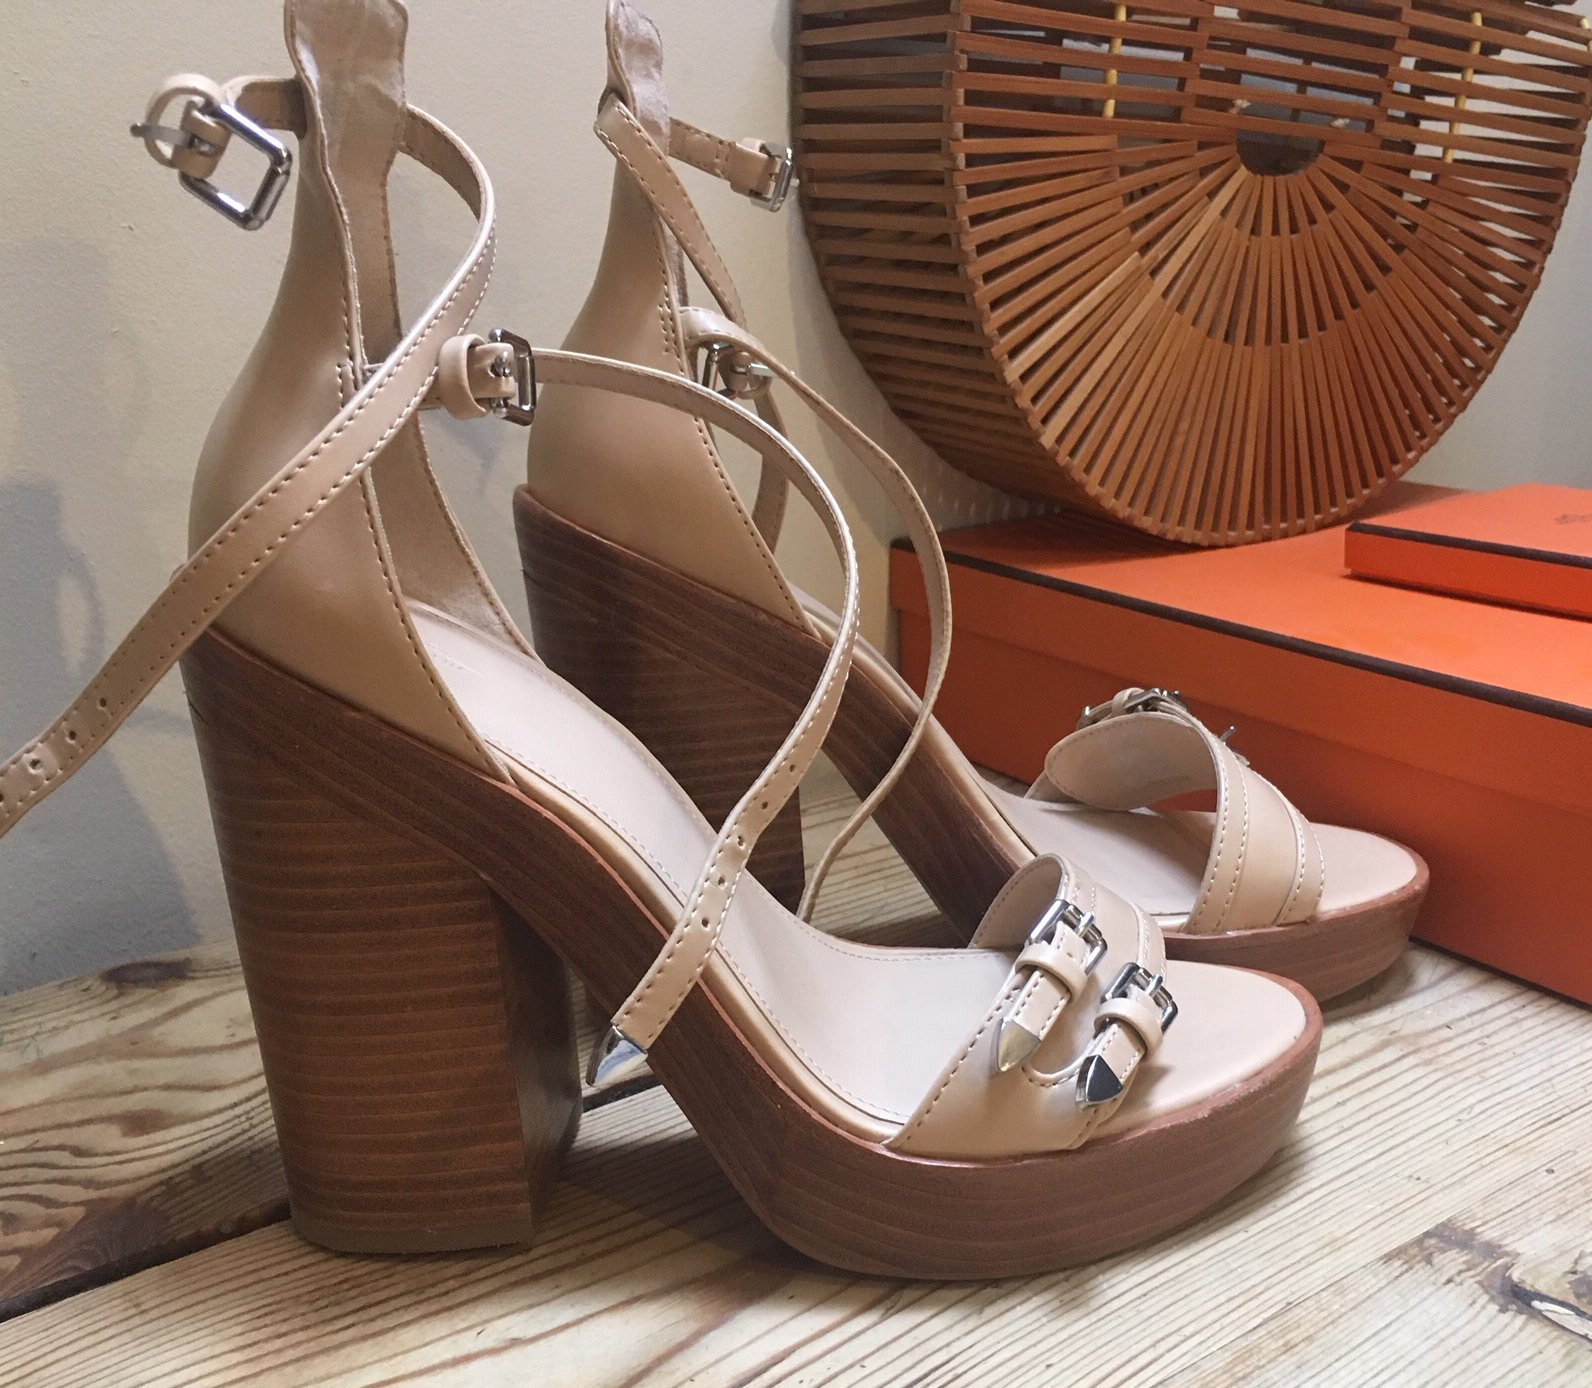 b2bdb8fe6f3 ZARA platå sandal sandalett beige creme trä klack 37 trend fest student ...